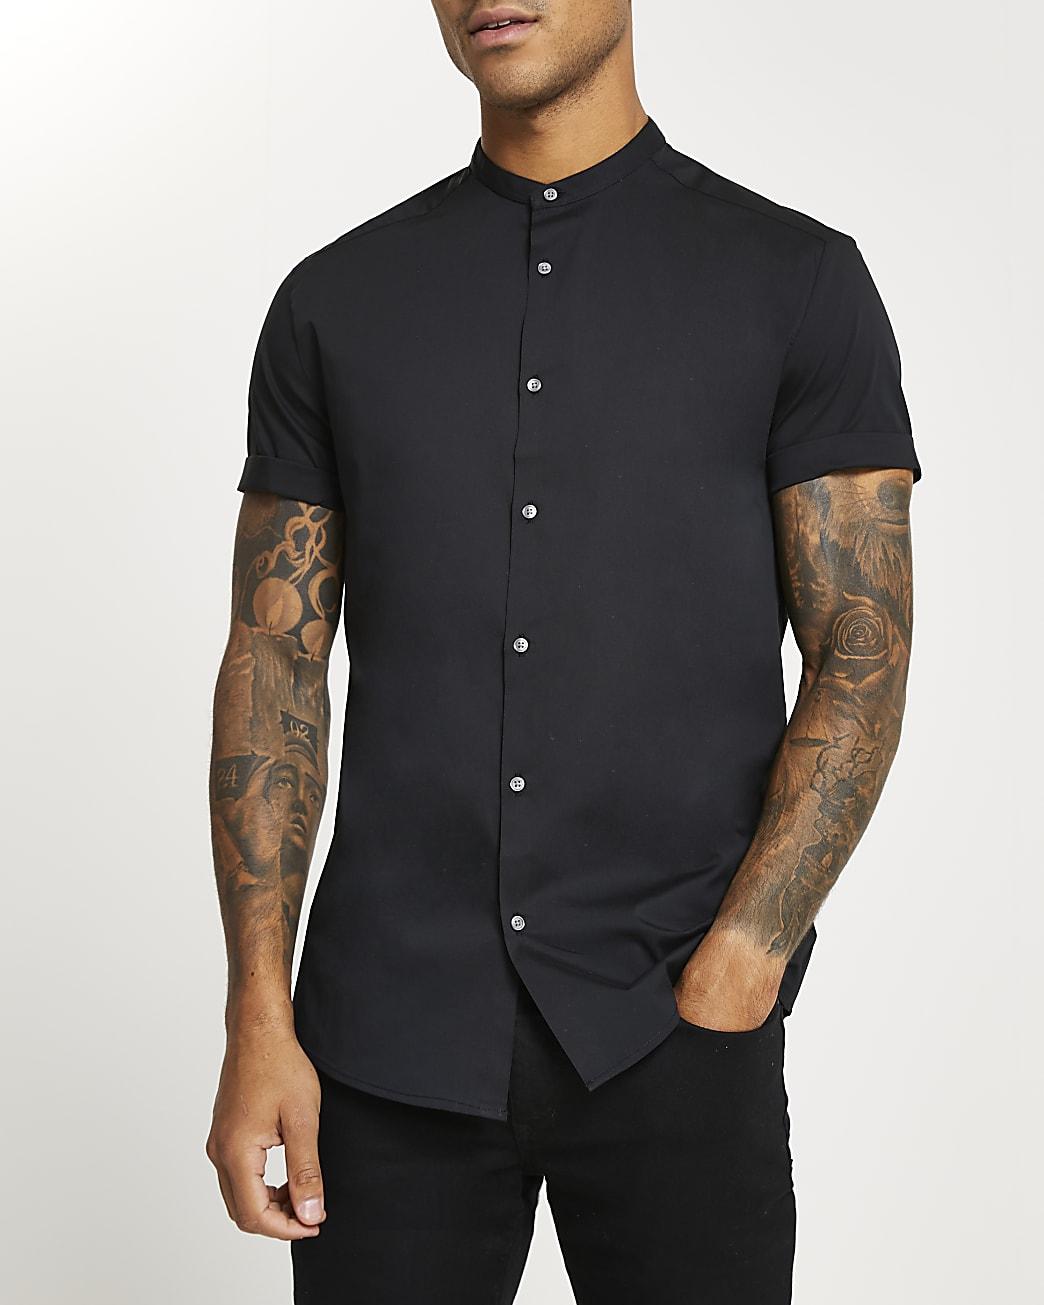 Black muscle fit grandad short sleeve shirt